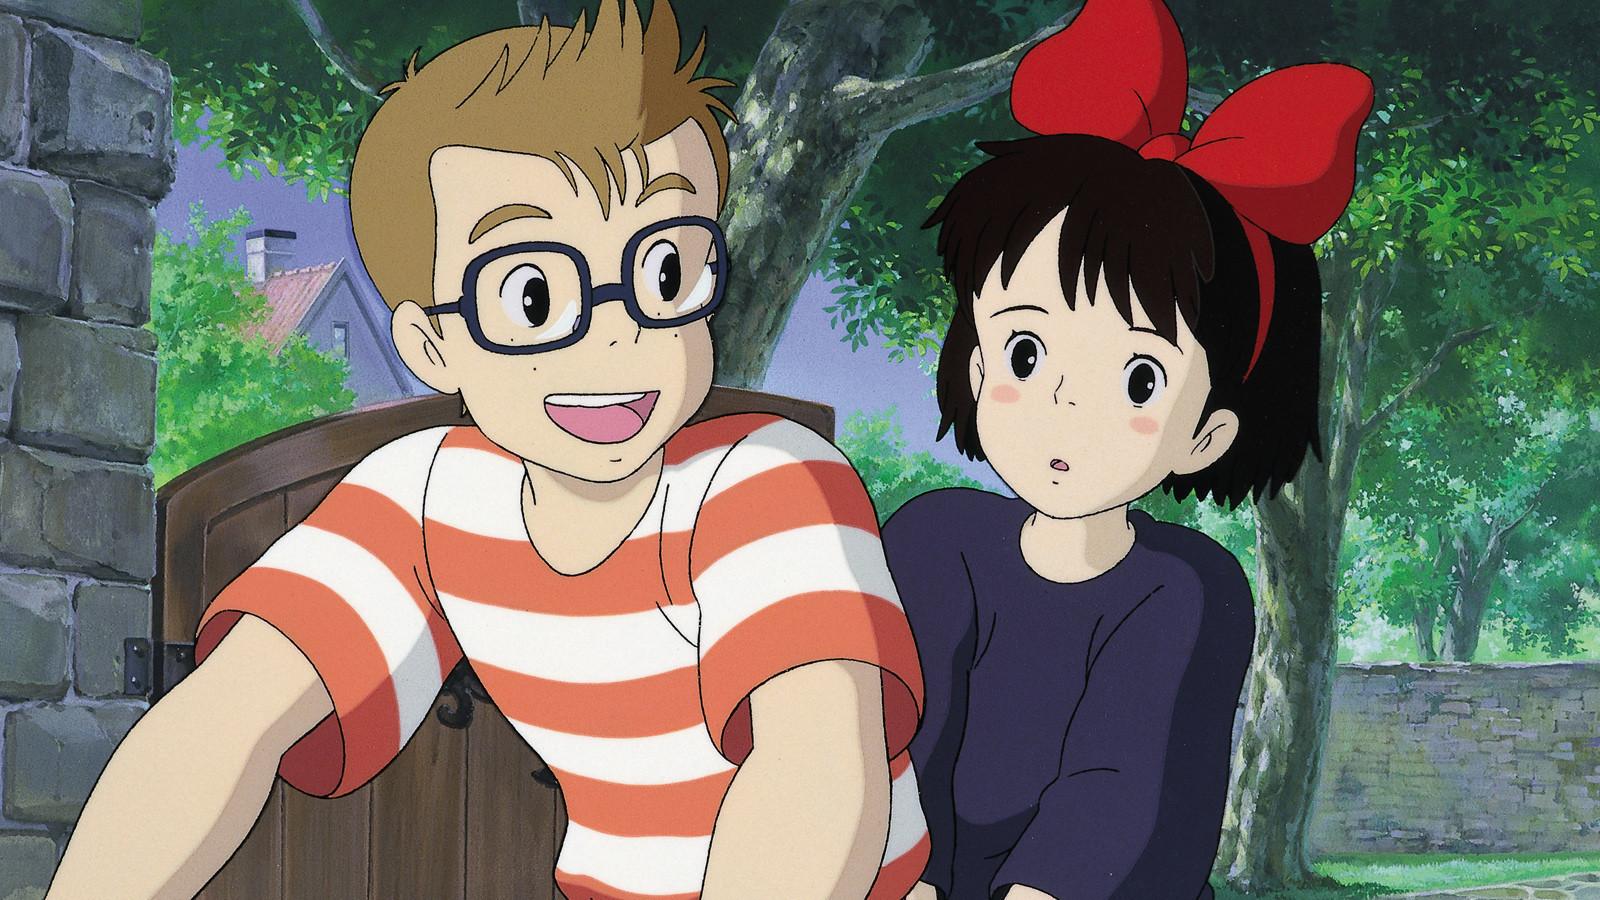 Review Hiyao Miyazaki adventure 'Kiki's Delivery Service' screens nationally